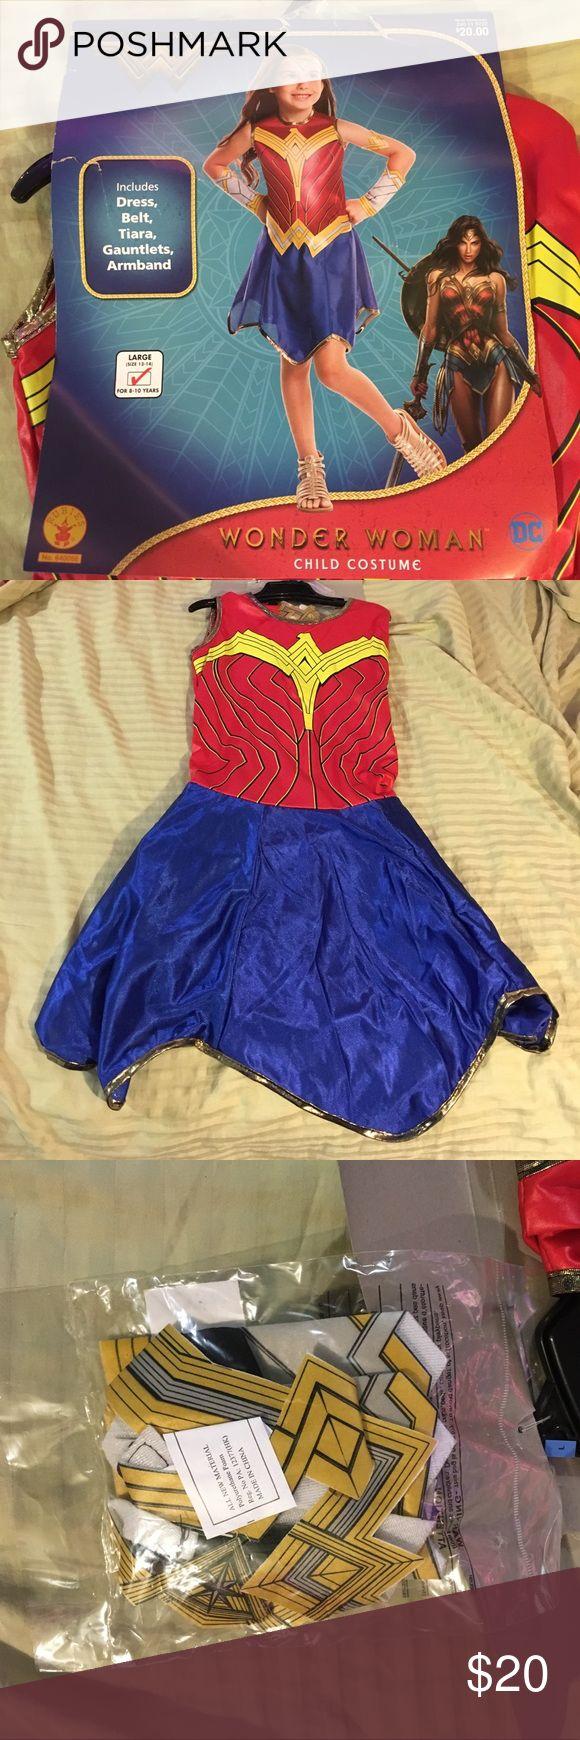 Kids Wonder Woman costume Includes: dress, belt, tiara, gauntlets, armband. Size Large (size 12-14) for 8-10 year olds. Rubies costume #640066 DC Comics Costumes Superhero